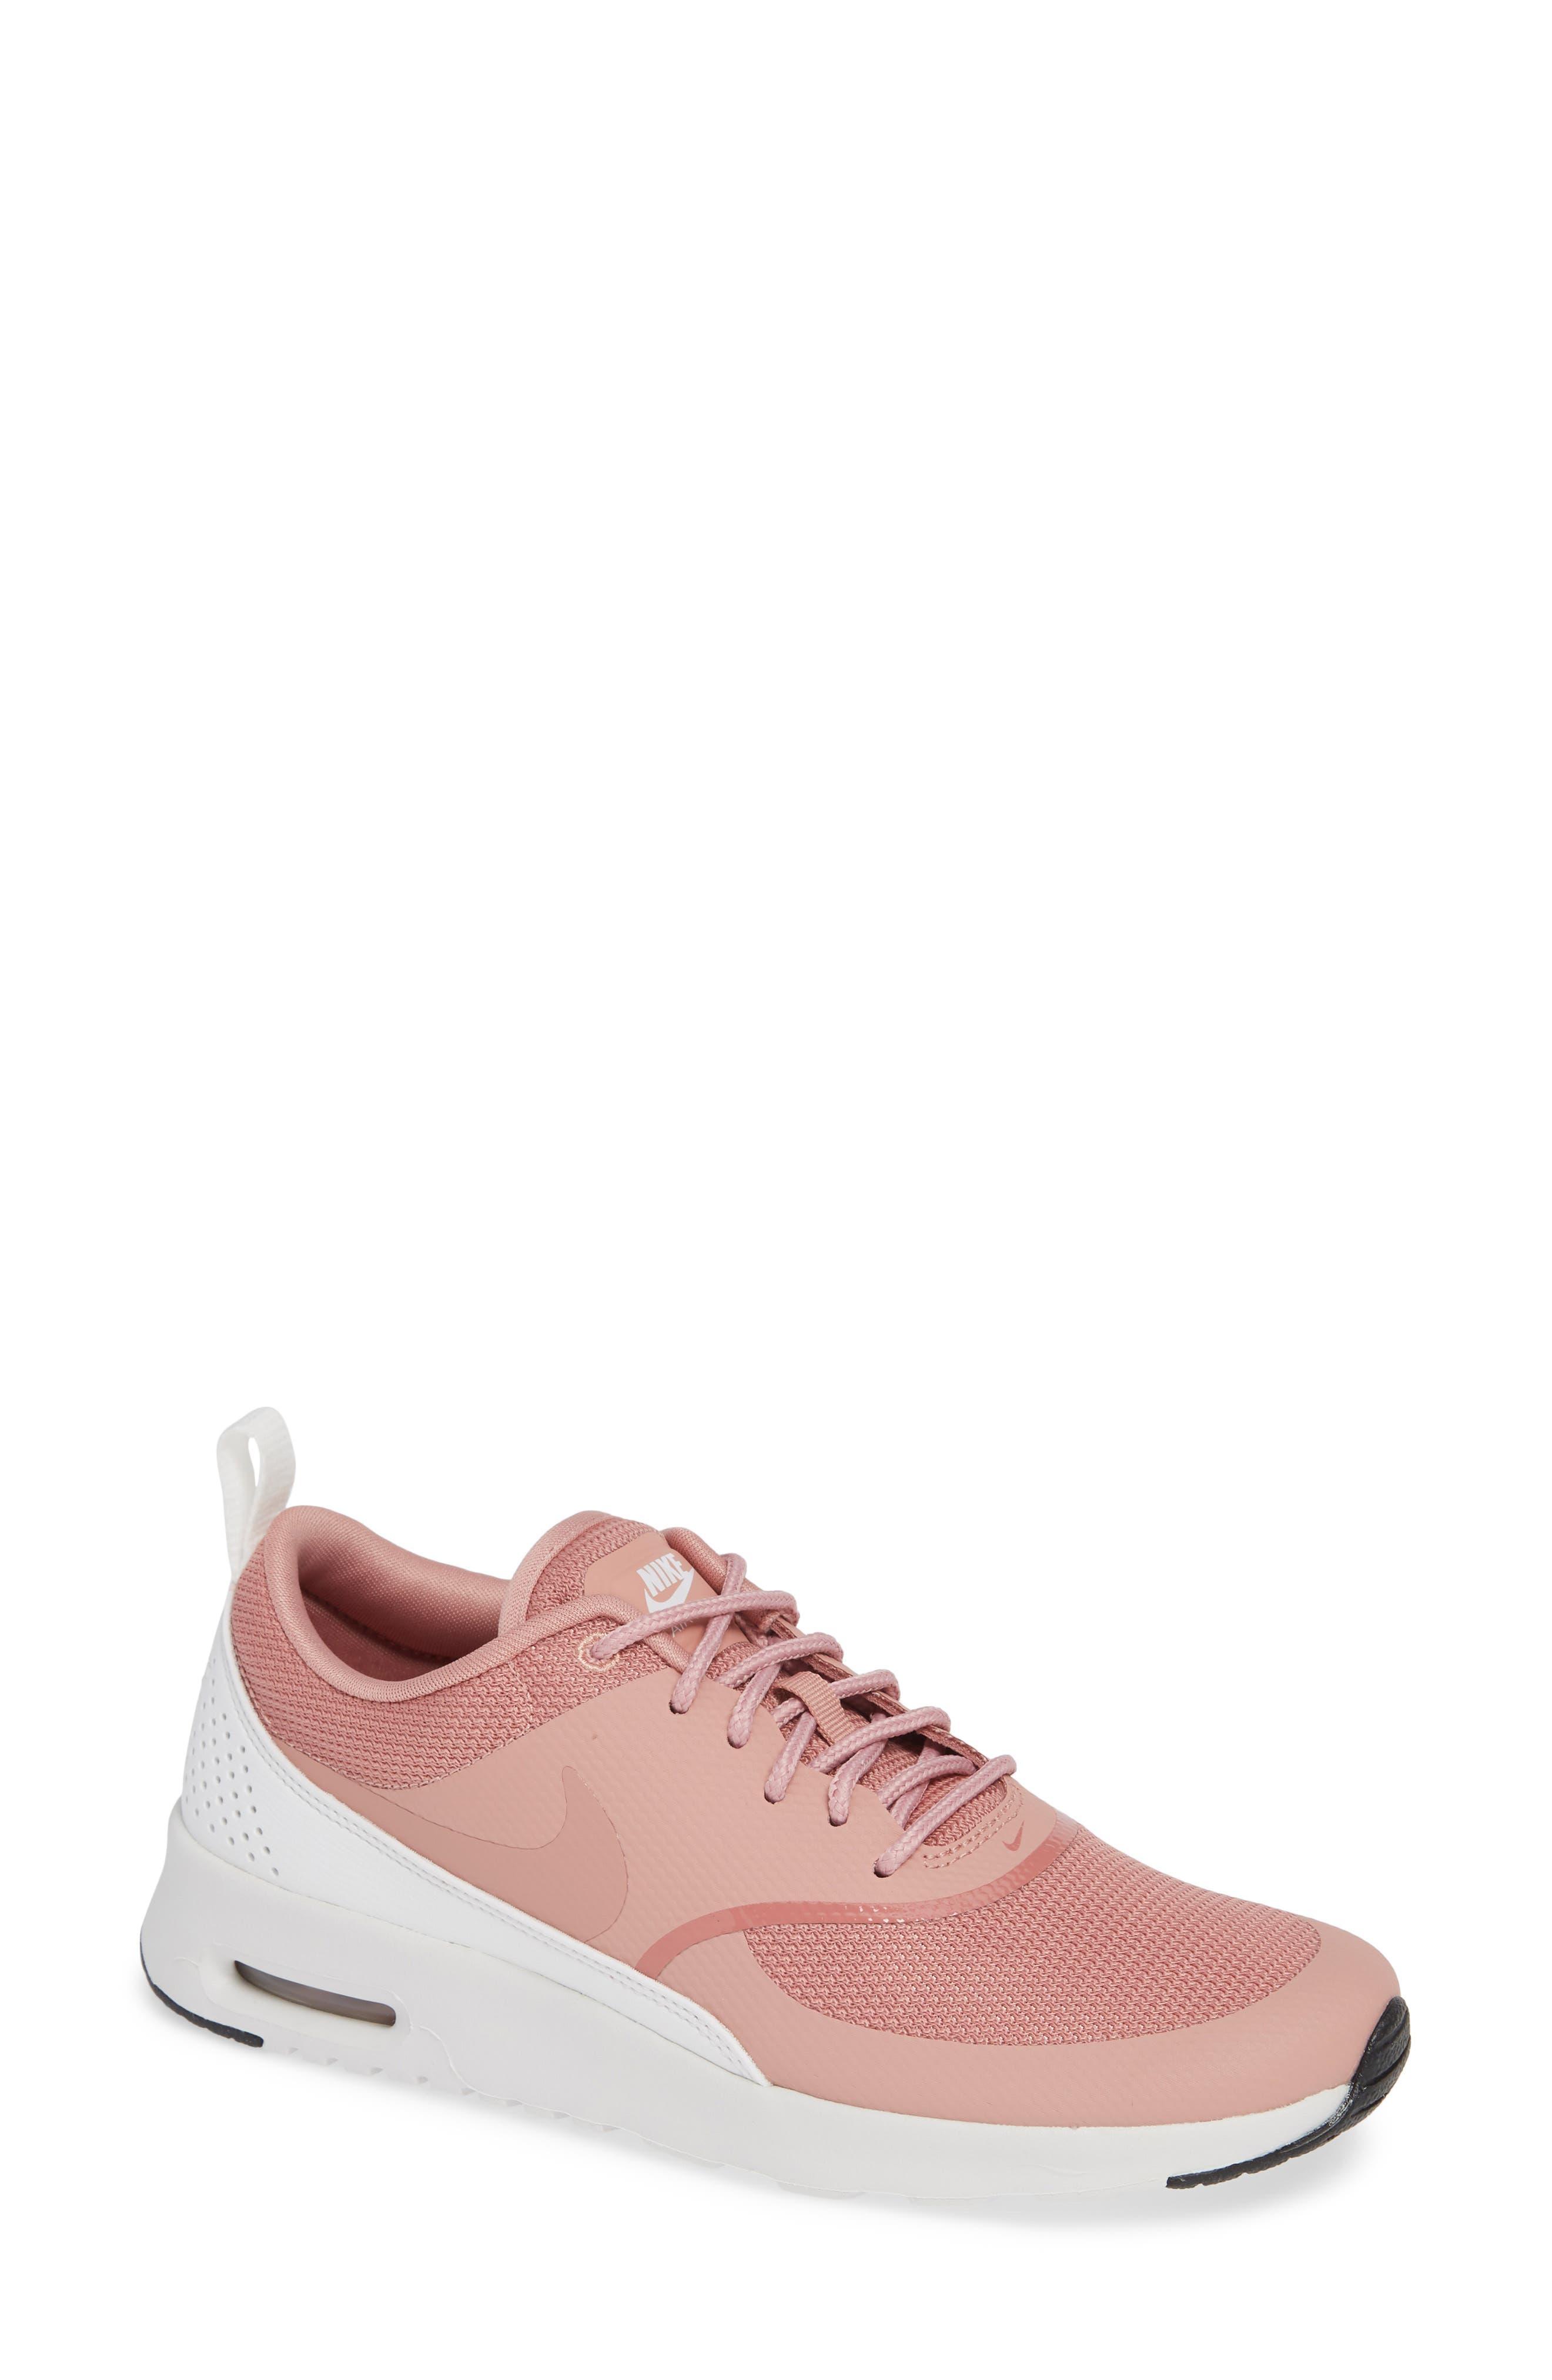 air max thea rust pink